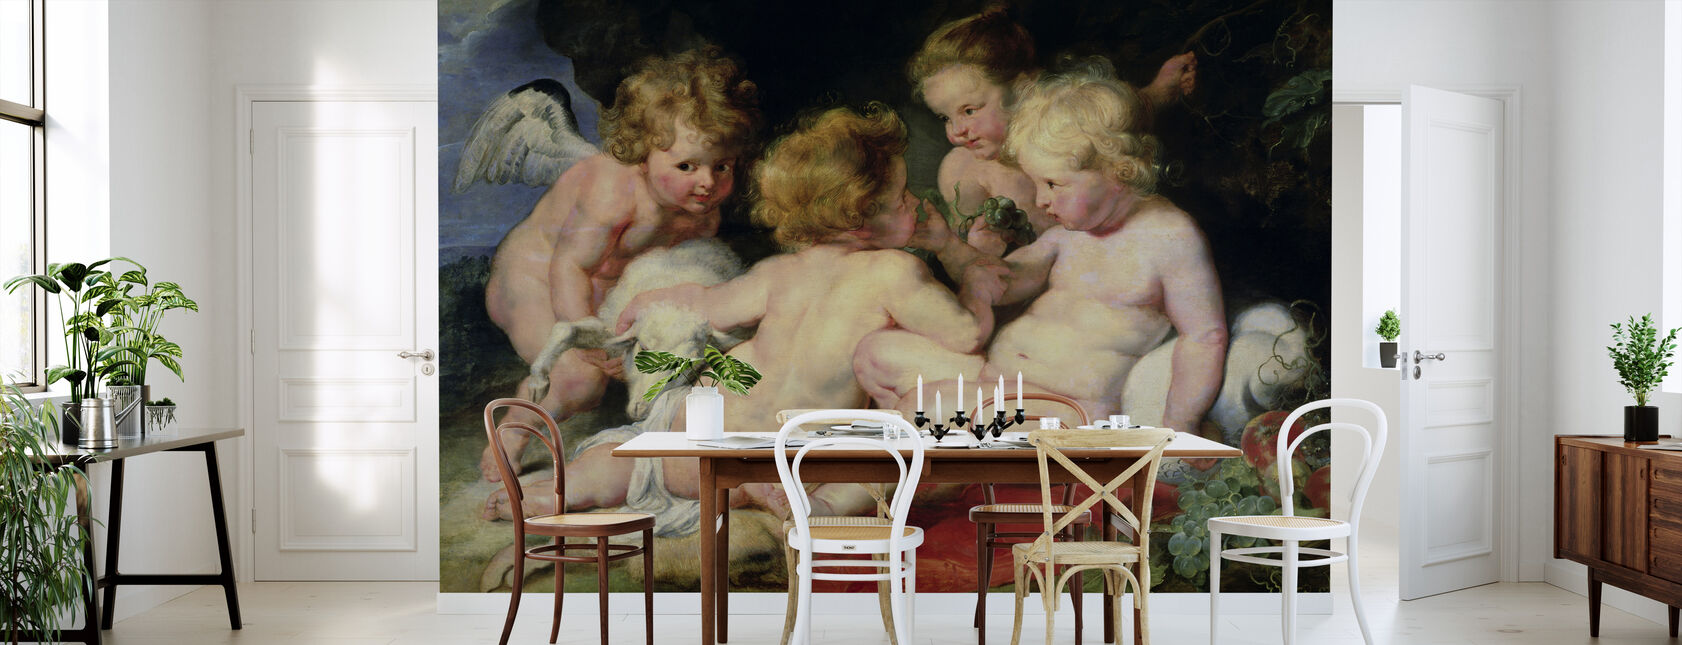 Spädbarn Kristus med Johannes Döparen, Peter Paul Rubens - Tapet - Kök